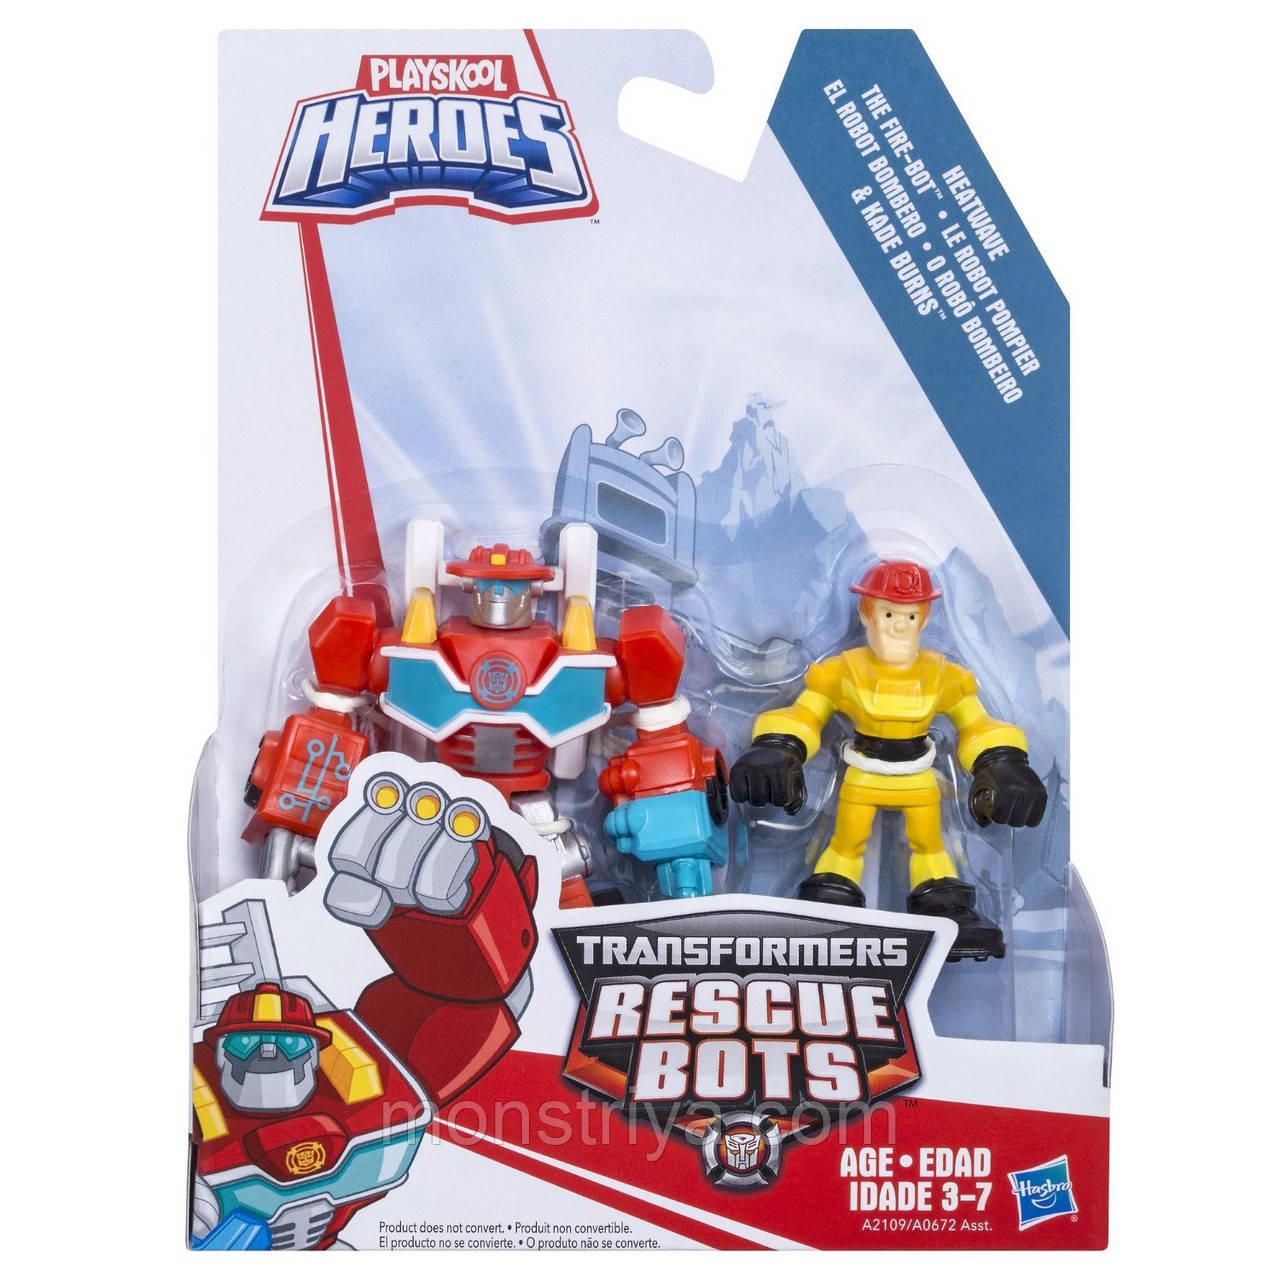 Боты спасатели, Playskool Heroes Transformers фигурка Heatwave Kade Burns